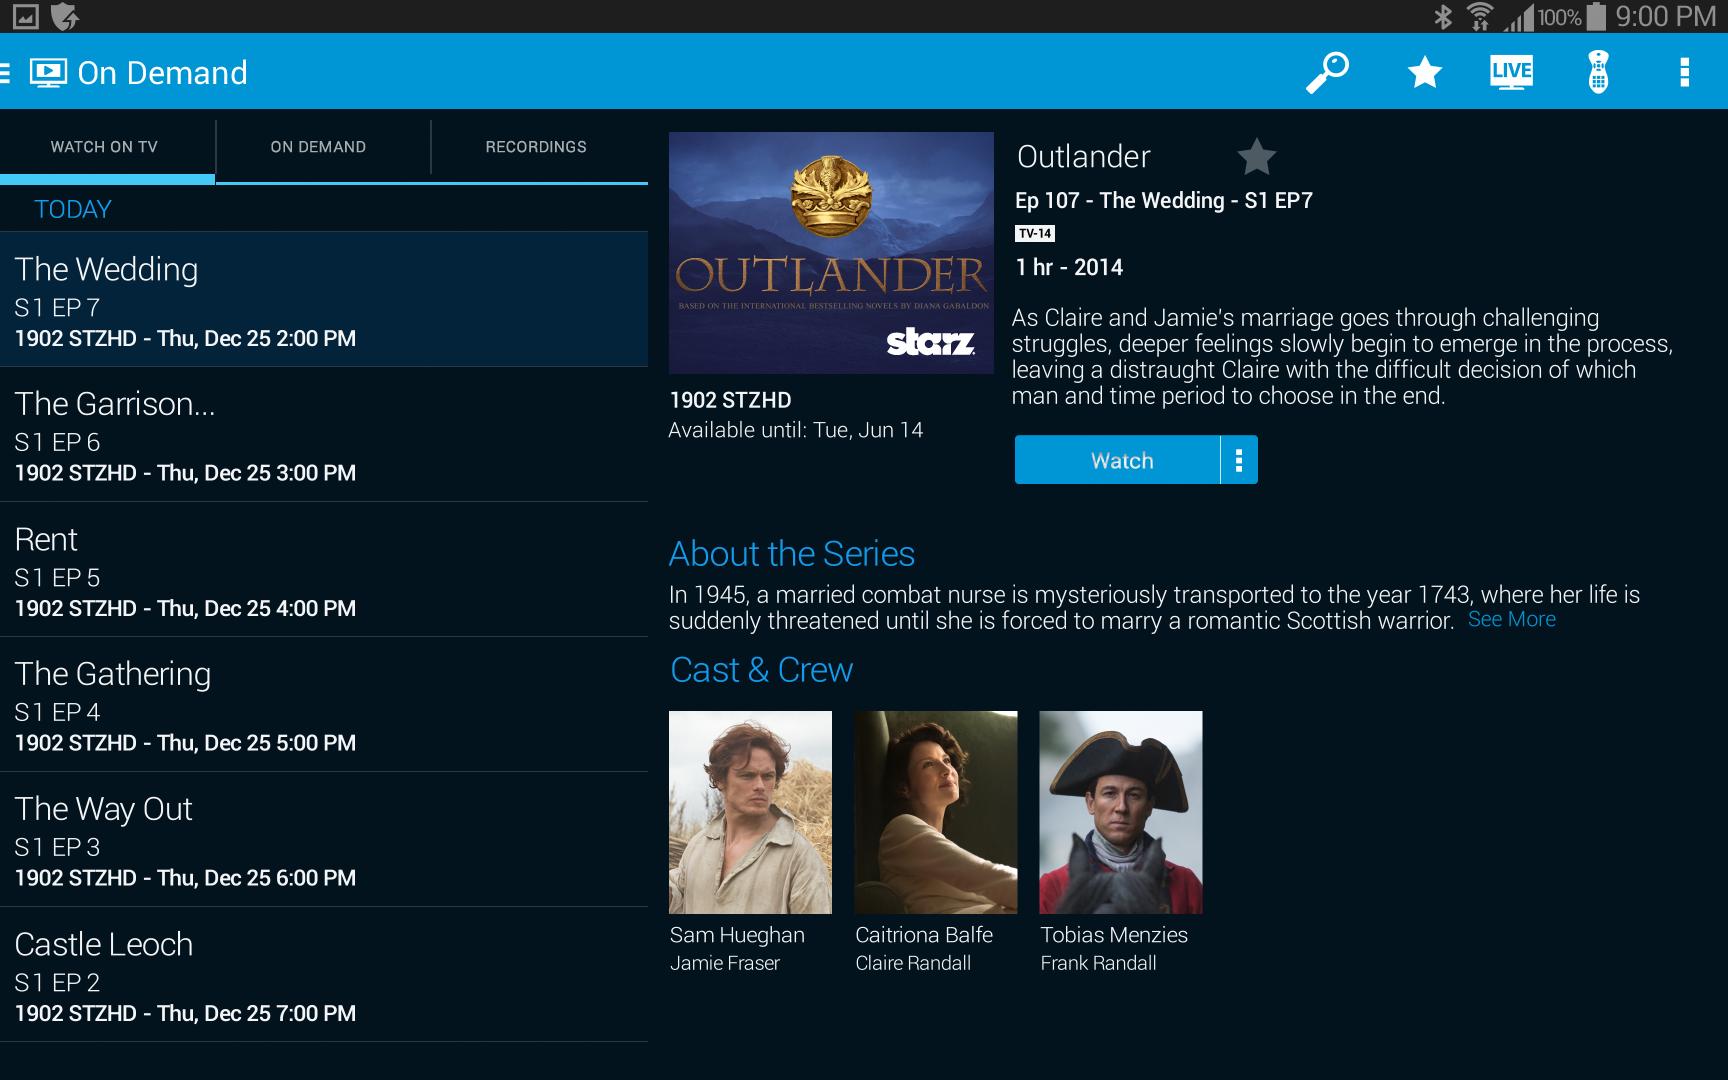 Att U Verse For Tablet Revenue Download Estimates Google Play Manage Dvr Online Phone